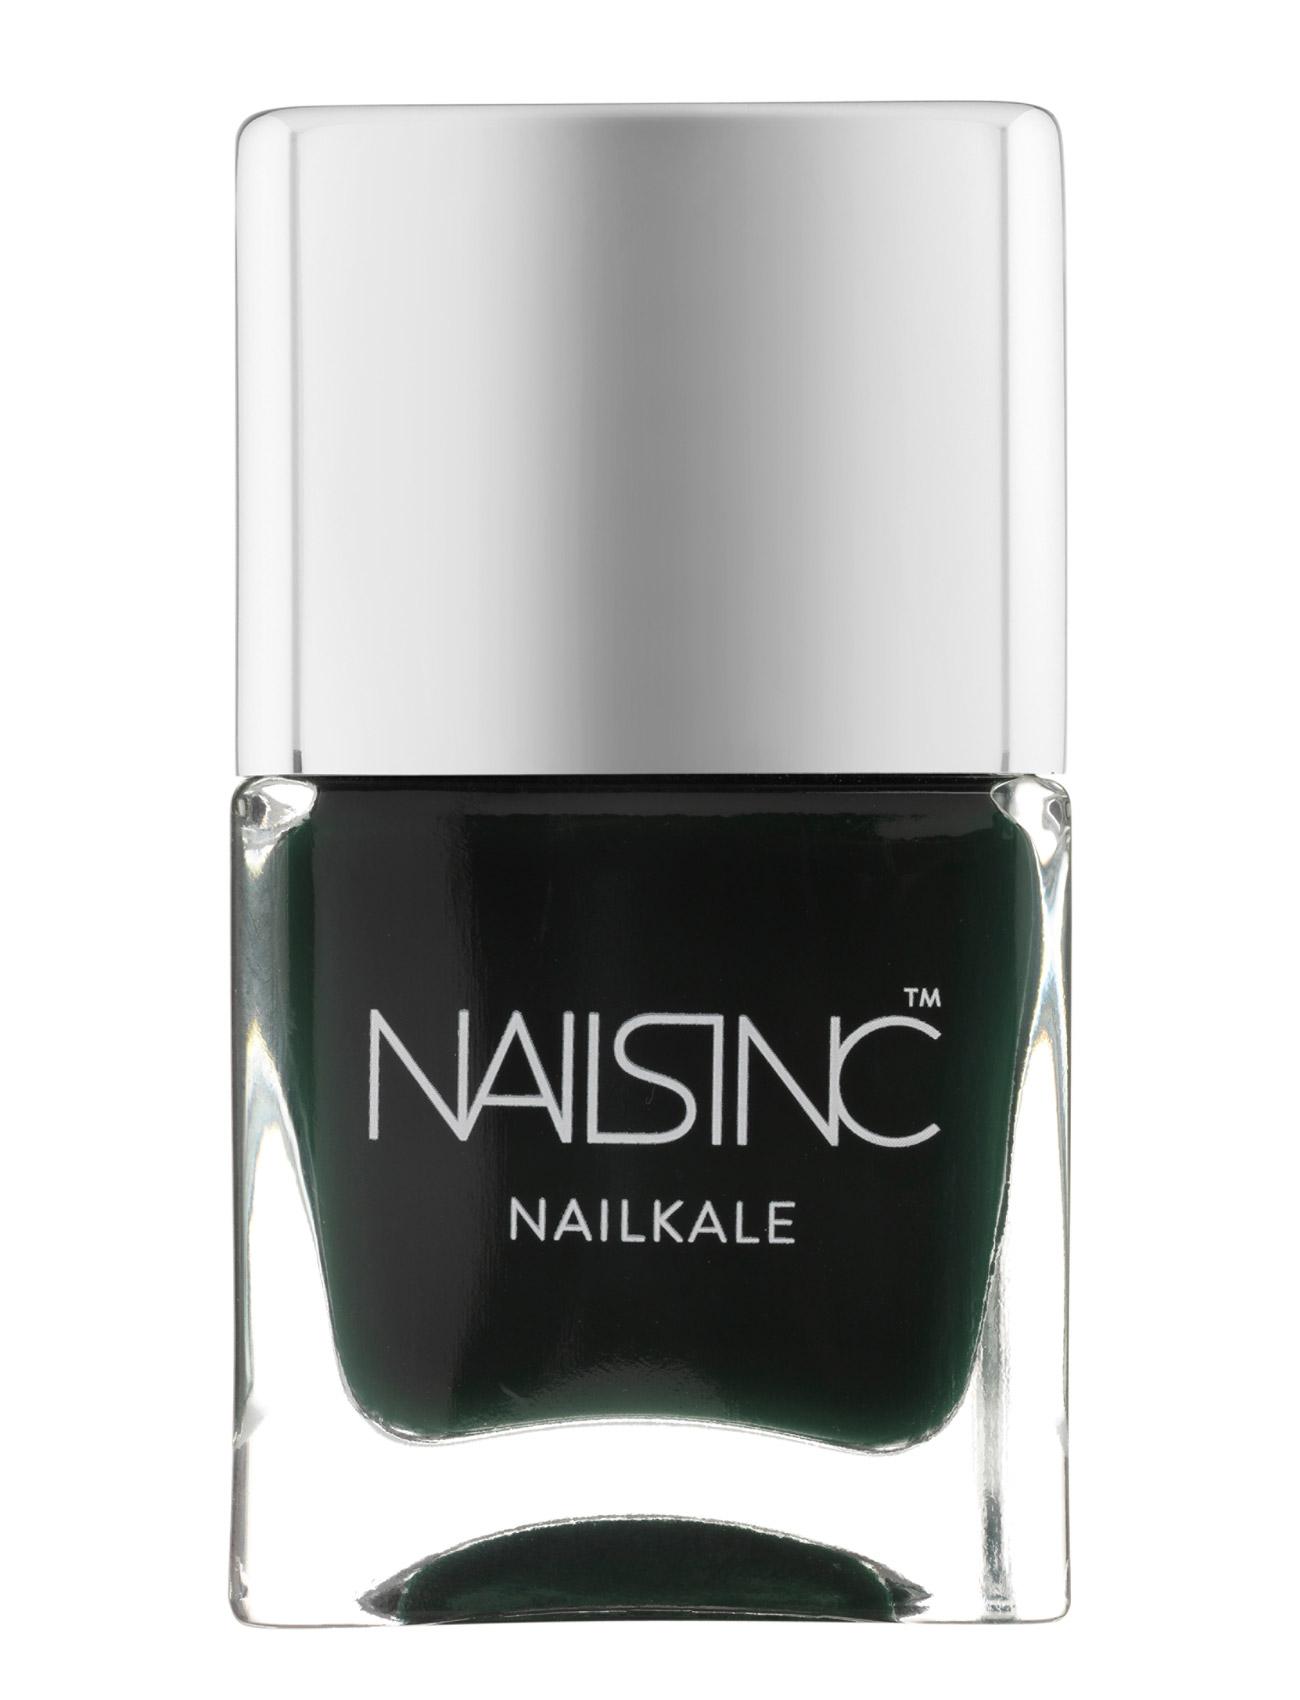 nails inc Nailkale holland walk fra boozt.com dk